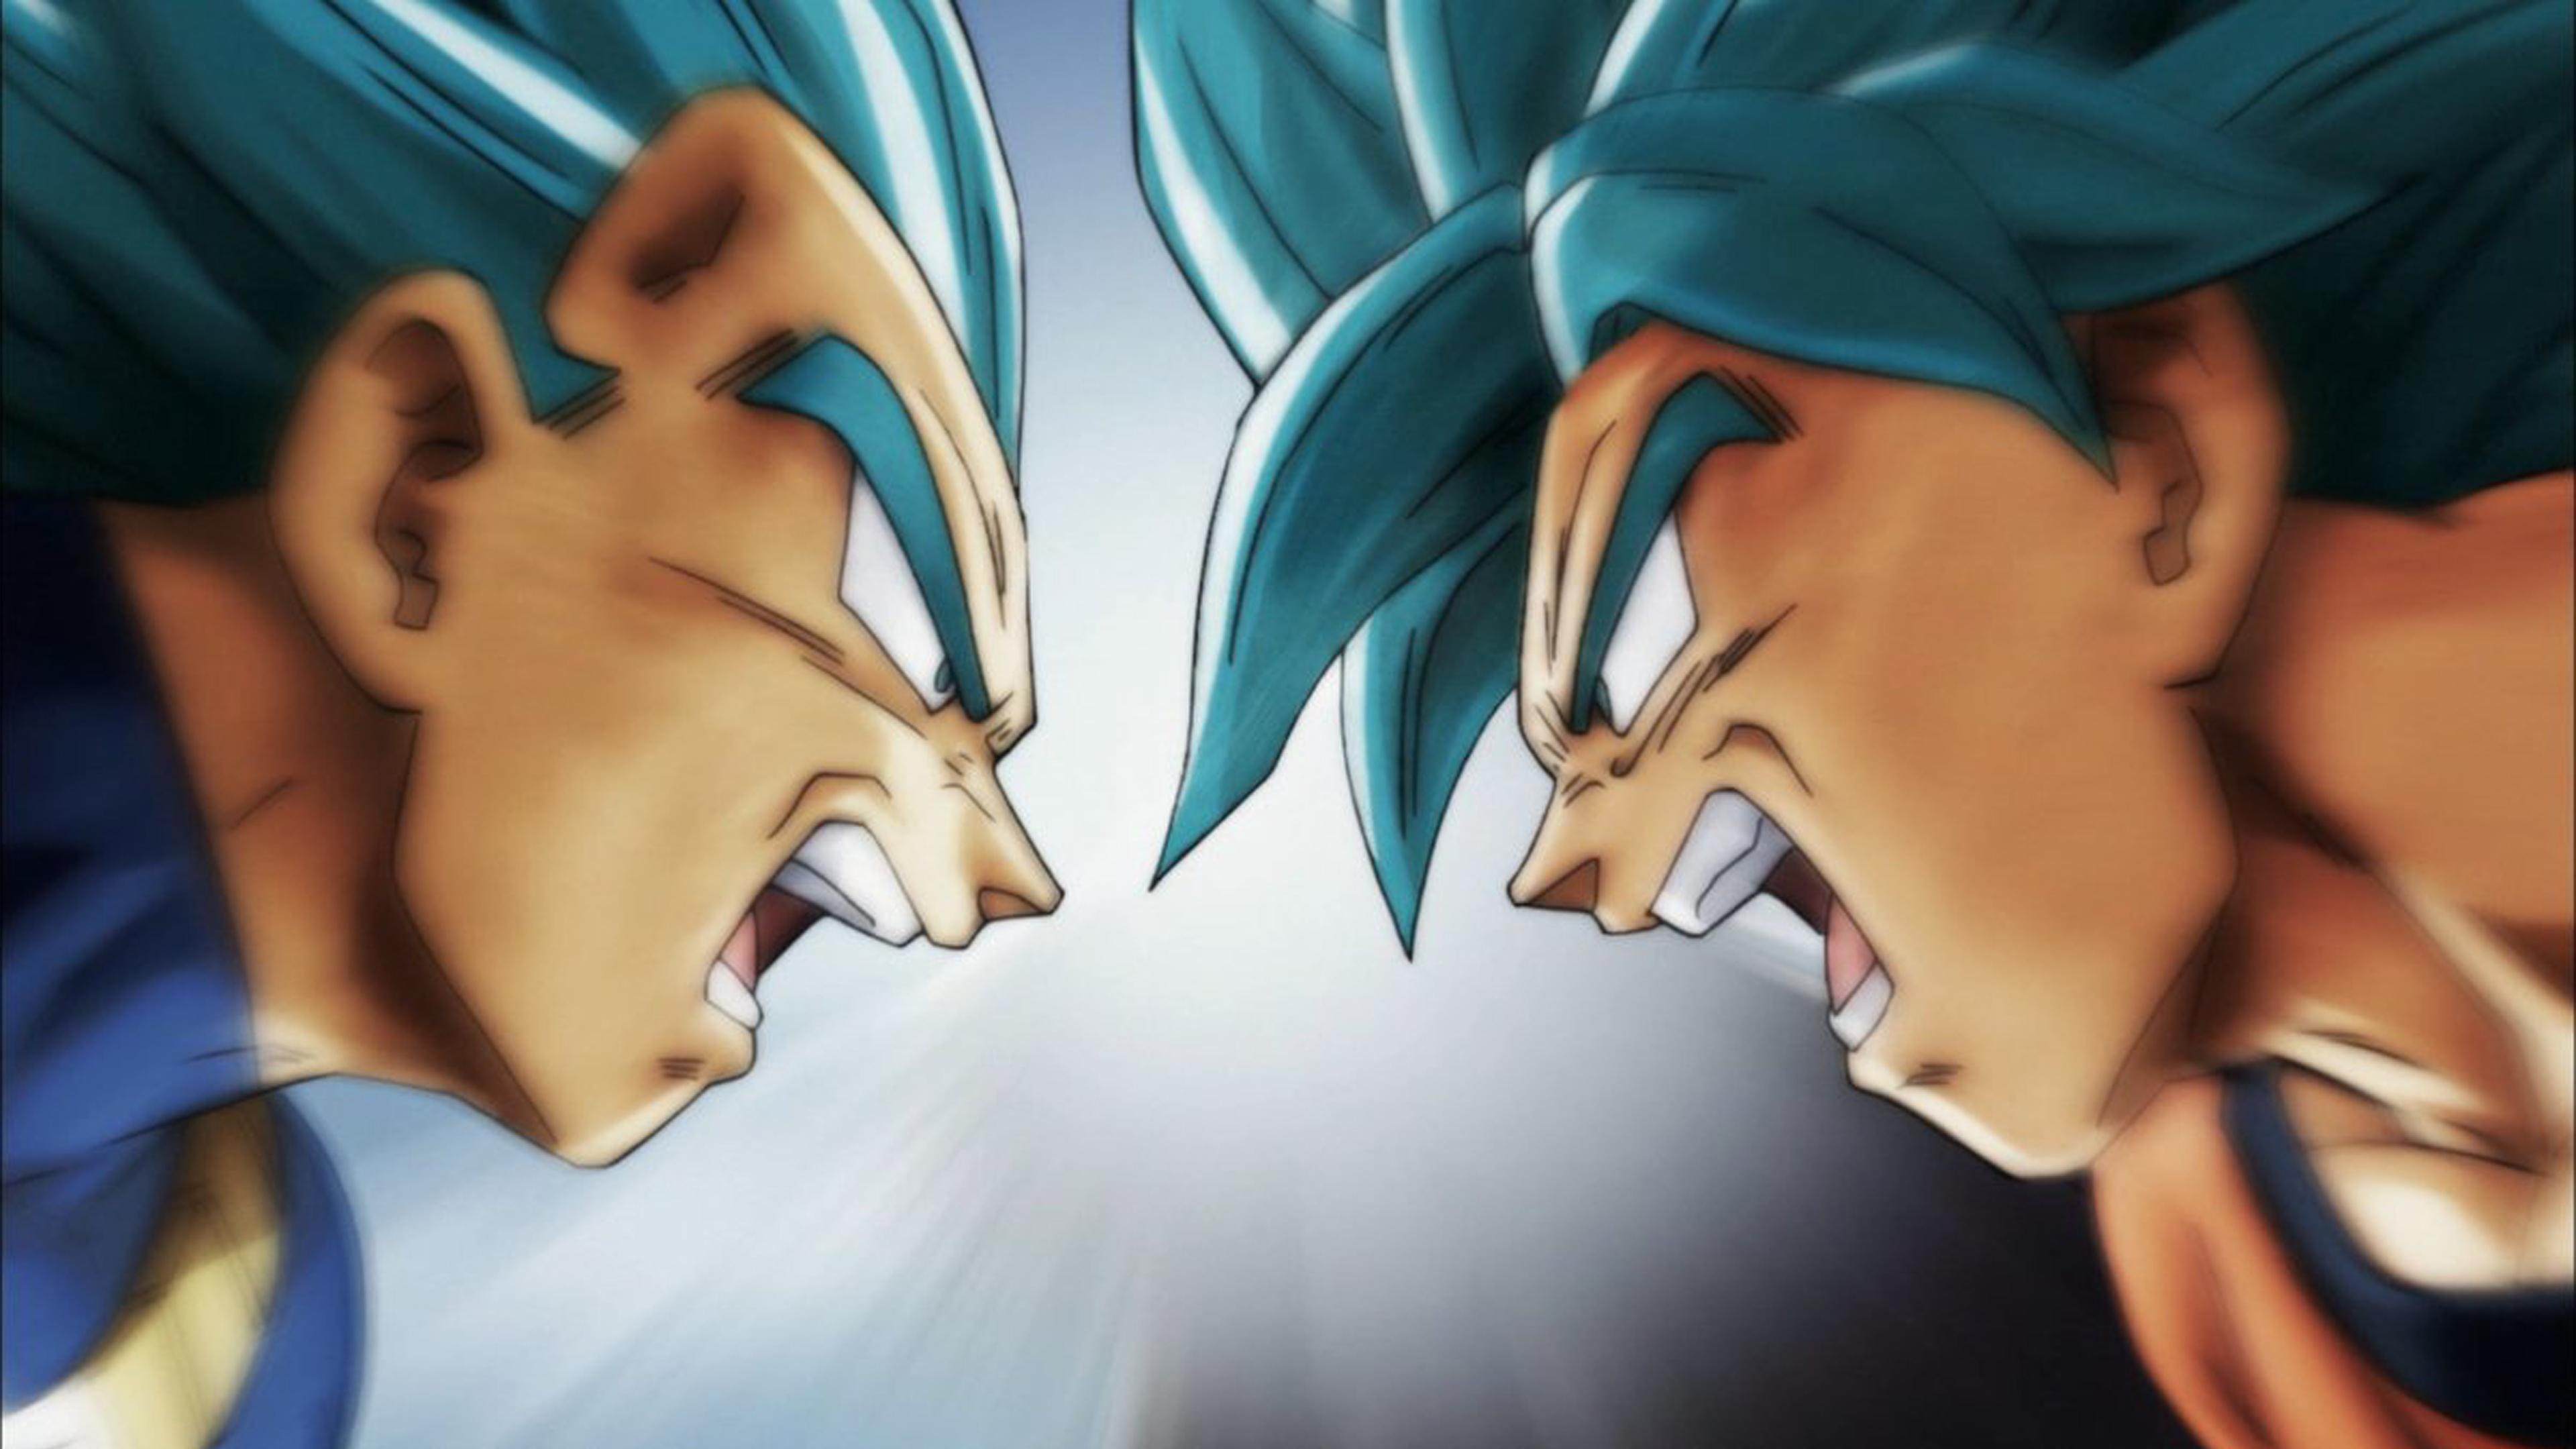 Dragon Ball Super Goku And Vegeta 3840x2160 Download Hd Wallpaper Wallpapertip